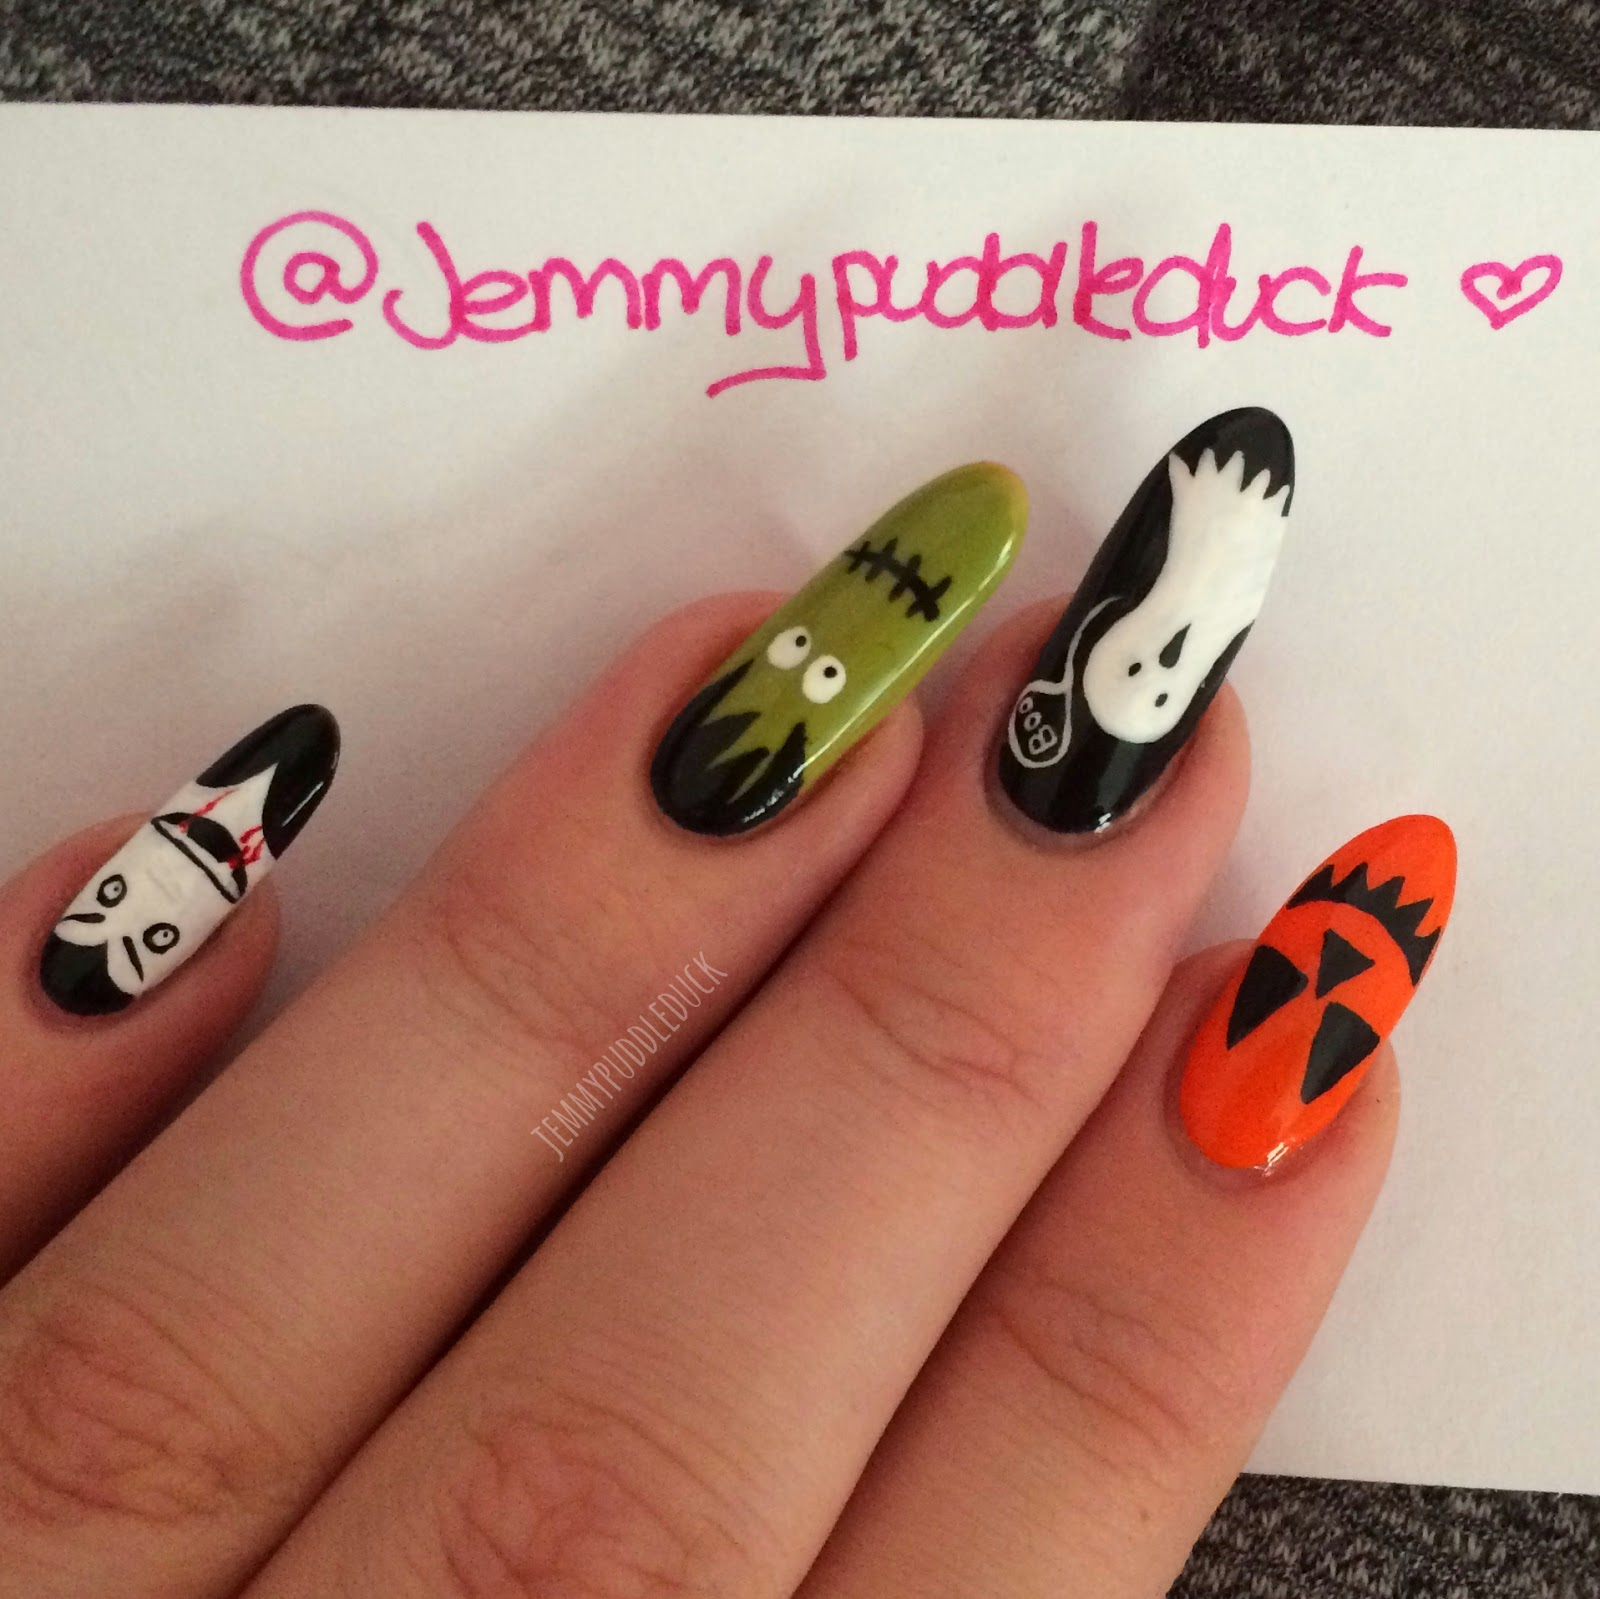 puddleducks nail posts: halloween nails 2014 - take one!